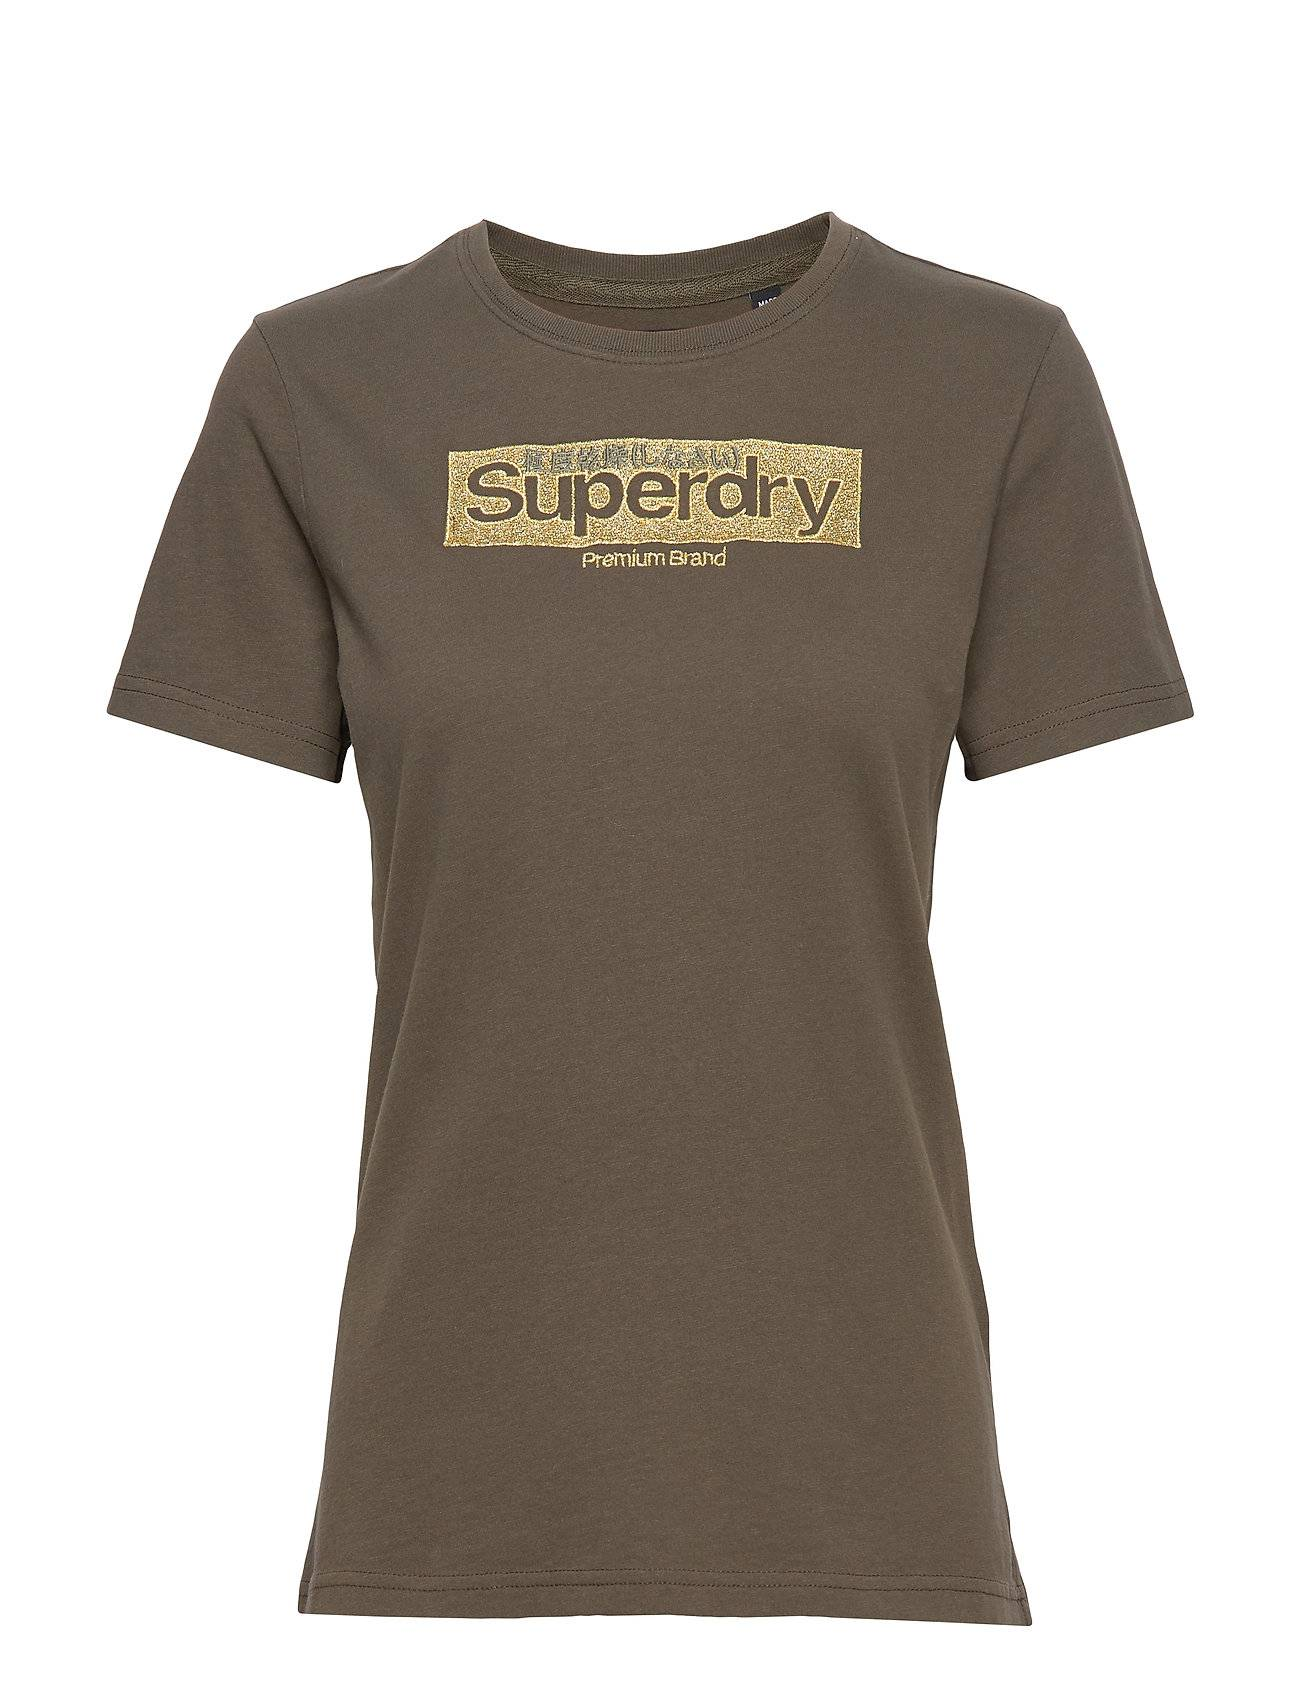 Superdry Premium Brand Emb Entry Tee T-shirts & Tops Short-sleeved Vihreä Superdry